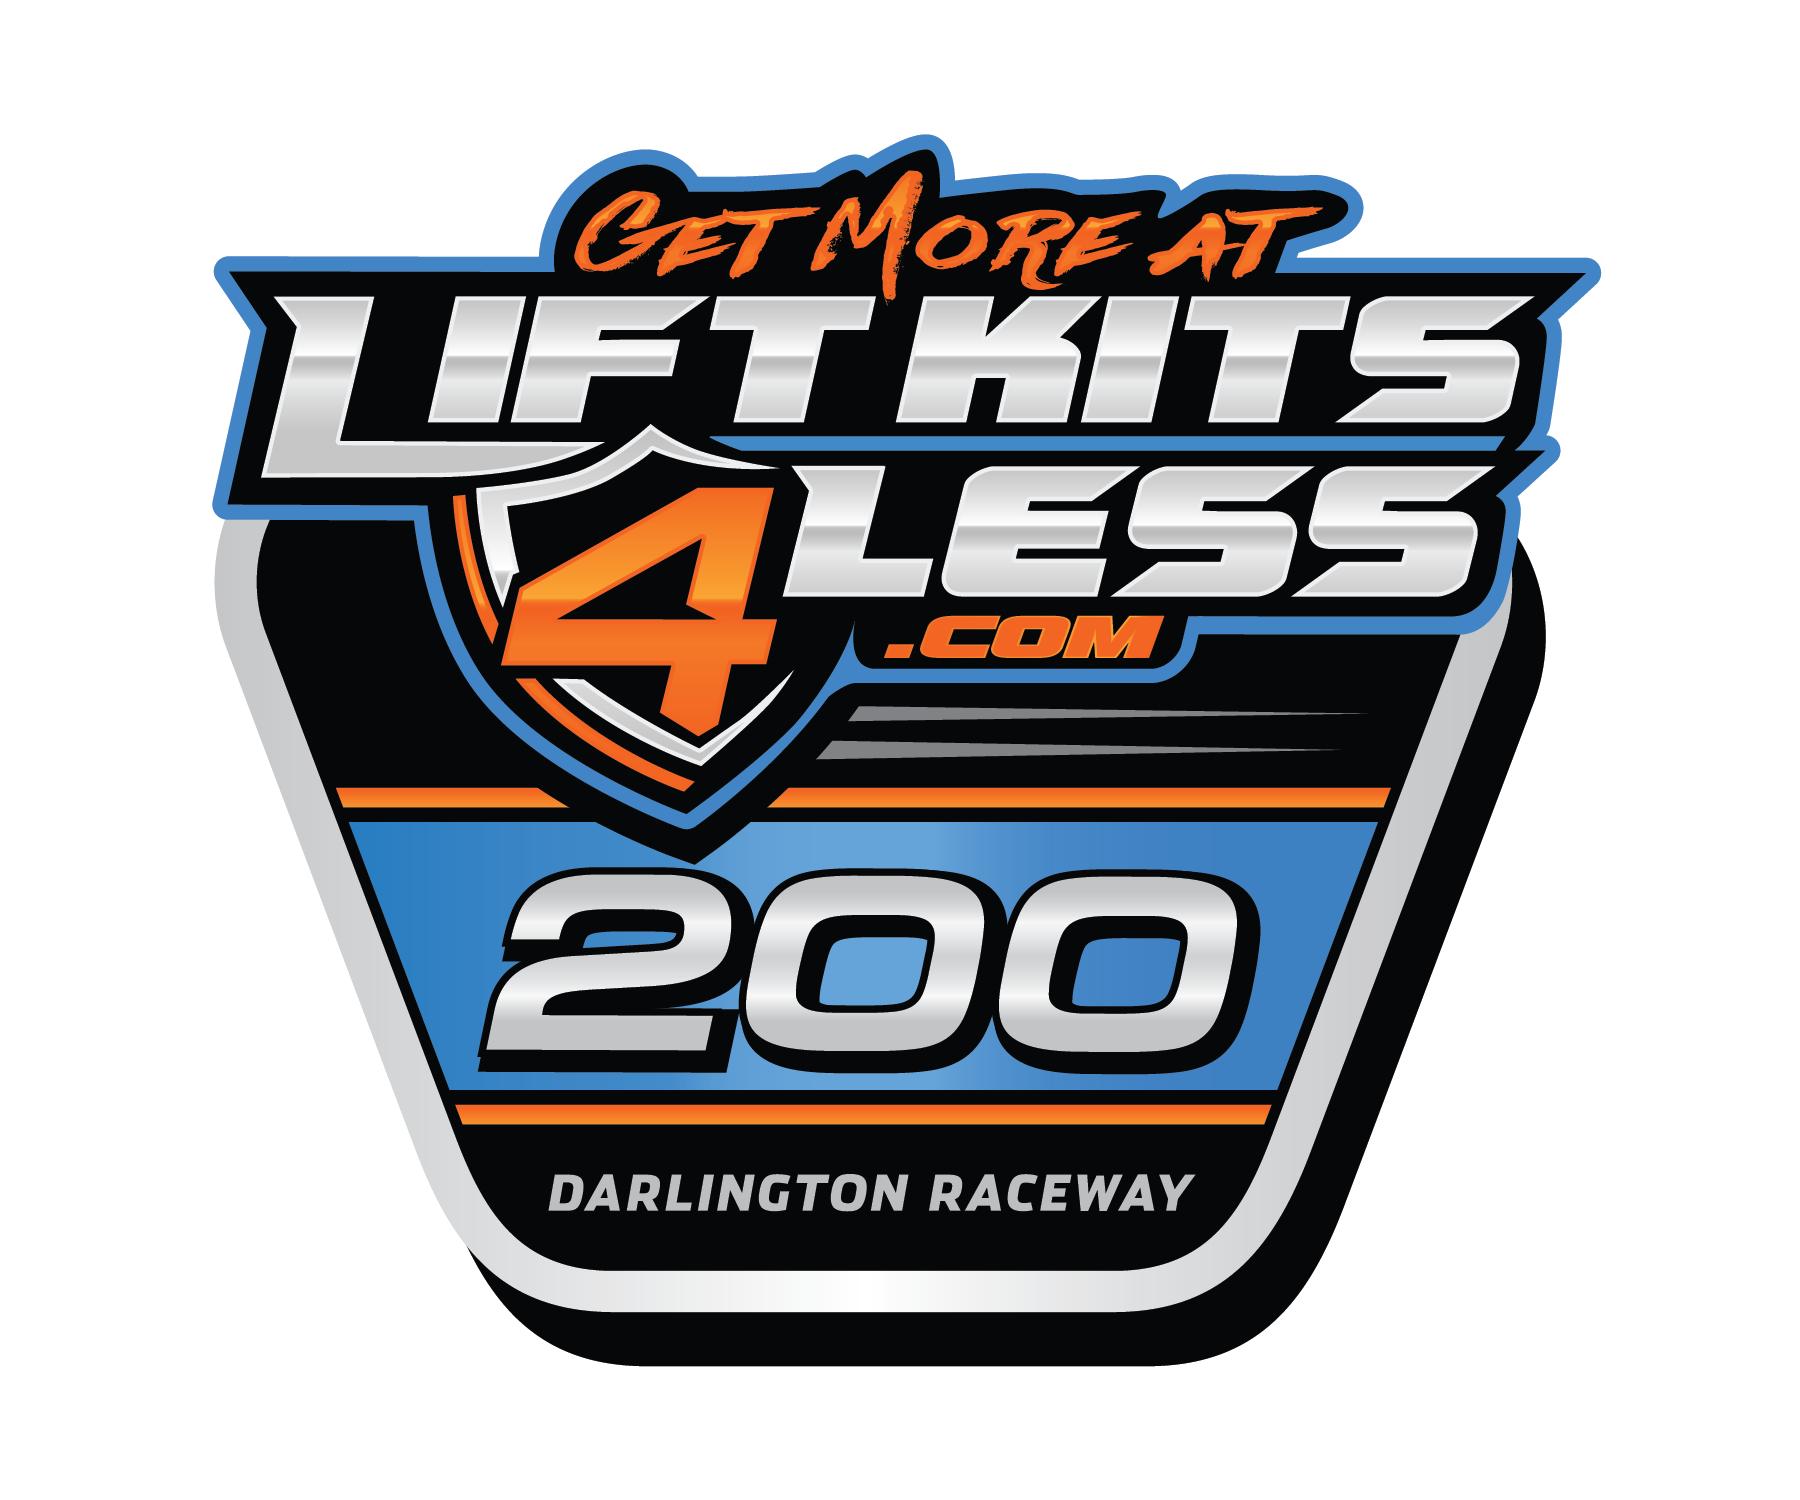 NASCAR Camping World Truck Series; LiftKits4Less.com 200